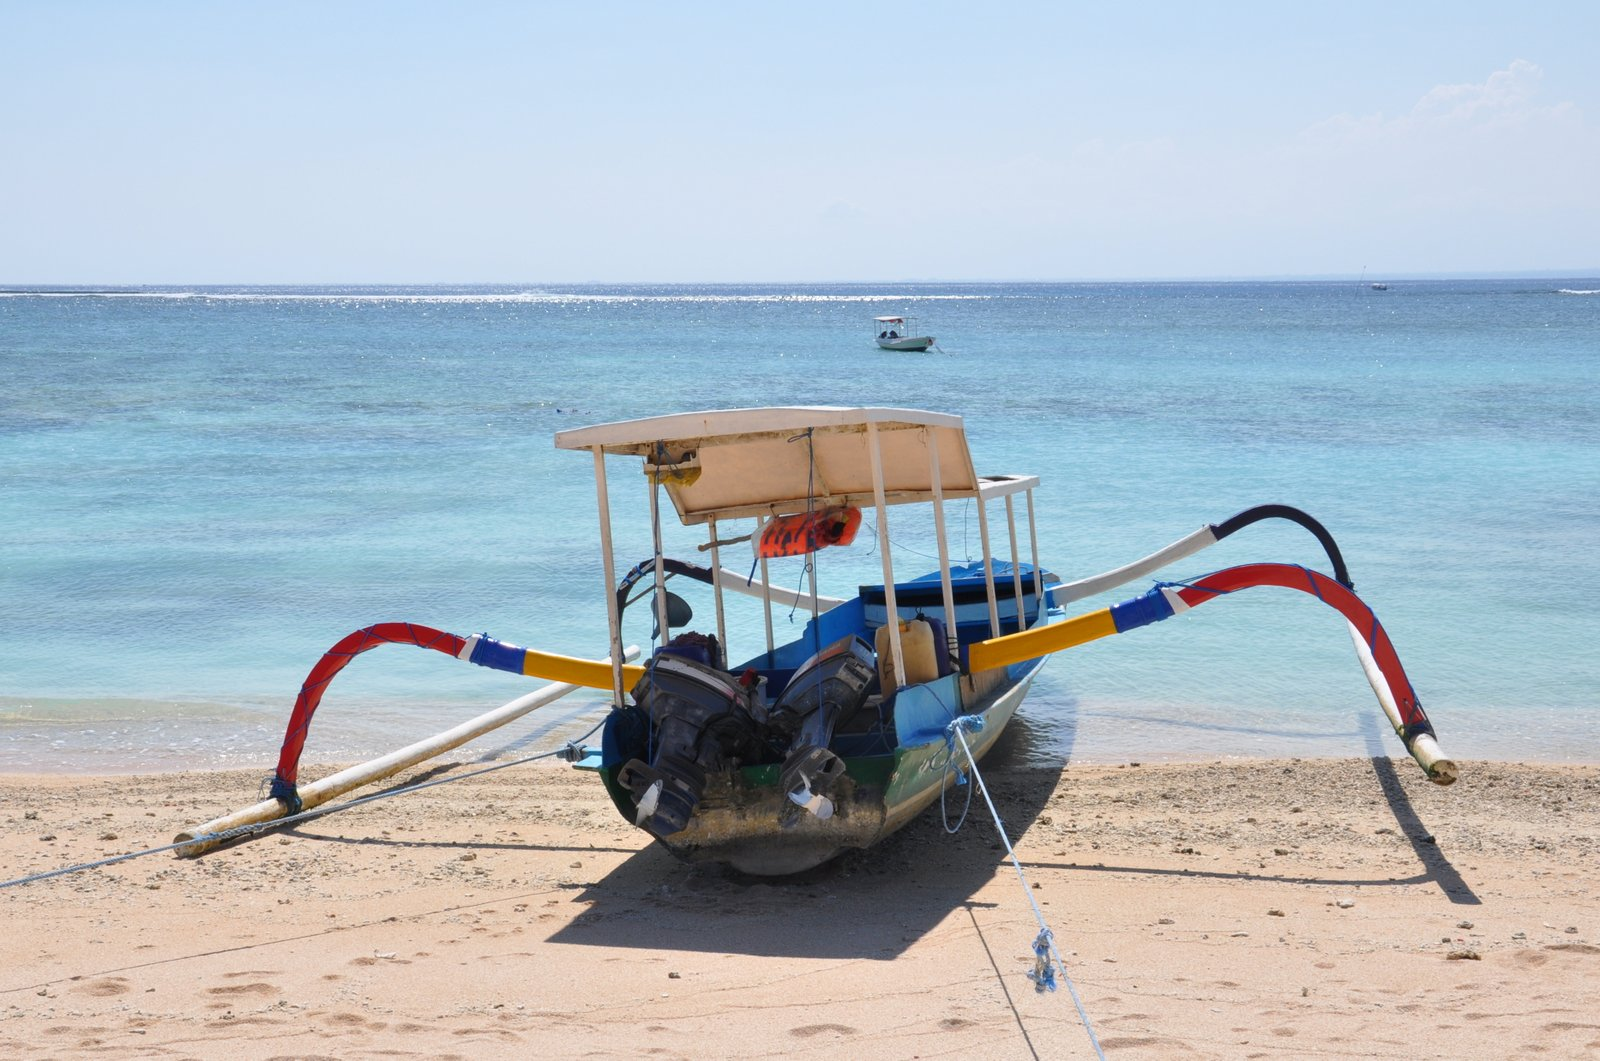 Un barco tradicional en la playa en Nusa Lembongan